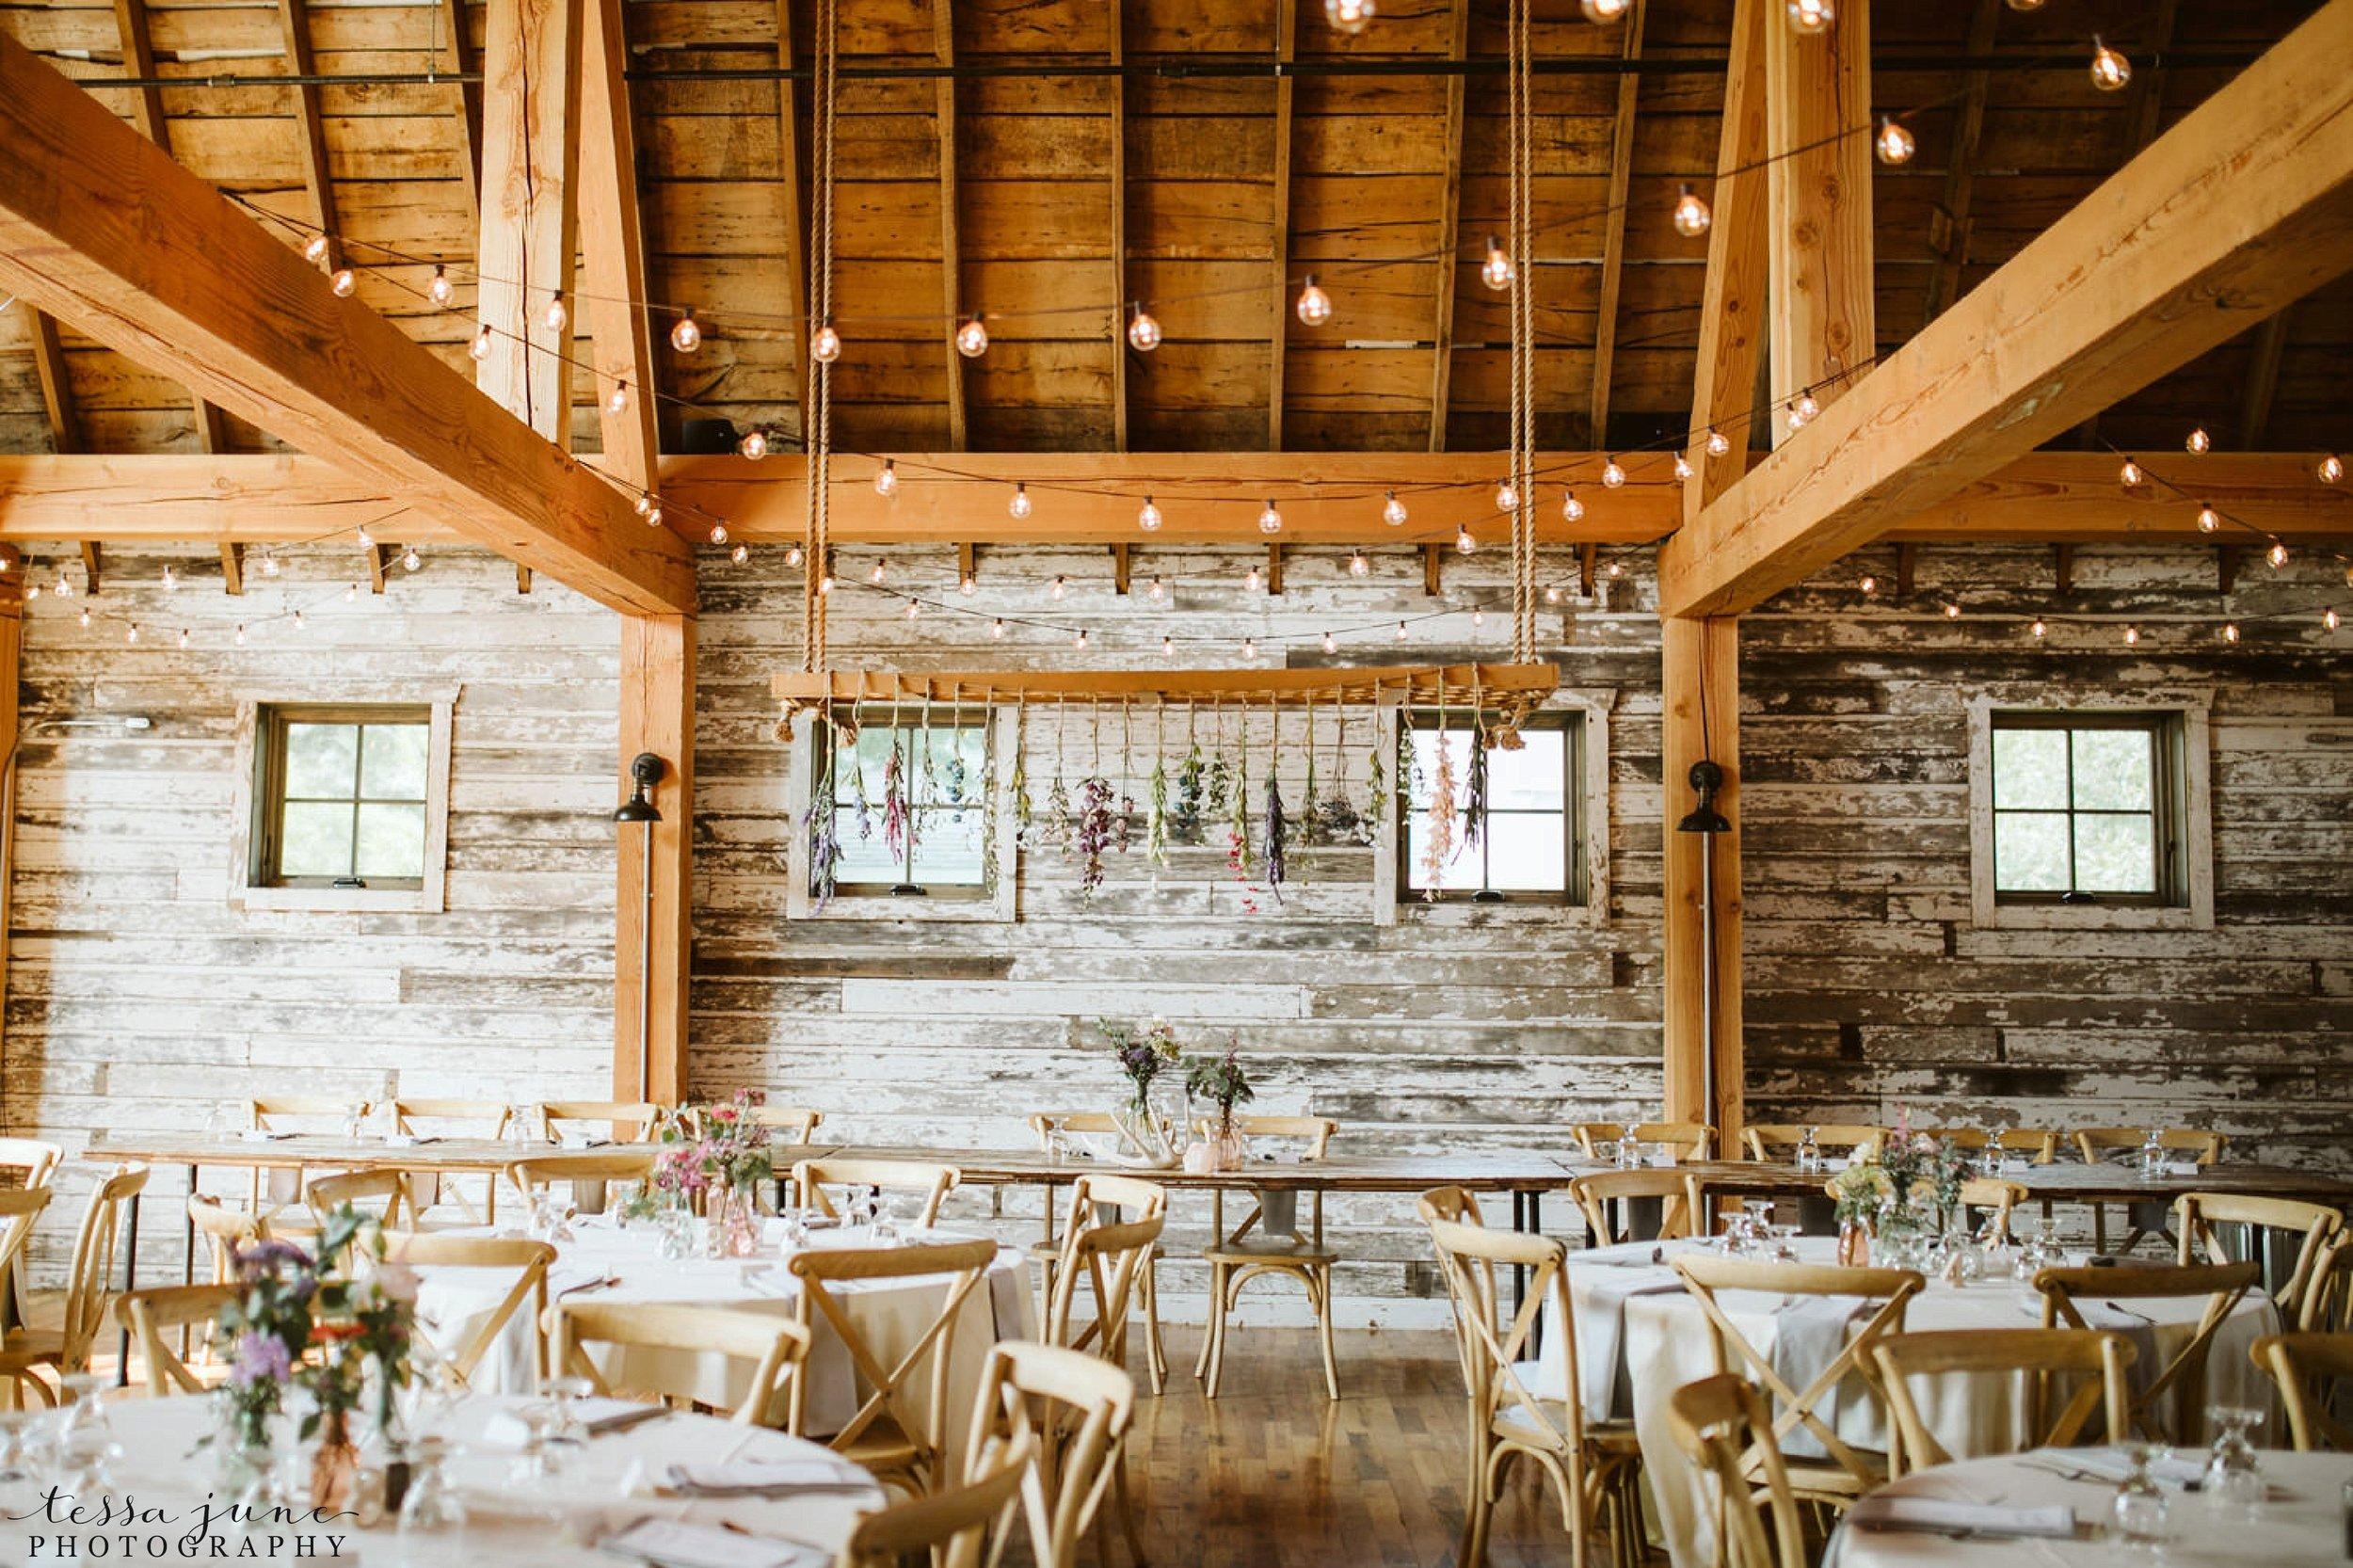 gathered-oaks-barn-wedding-alexandria-minnesota-126.jpg